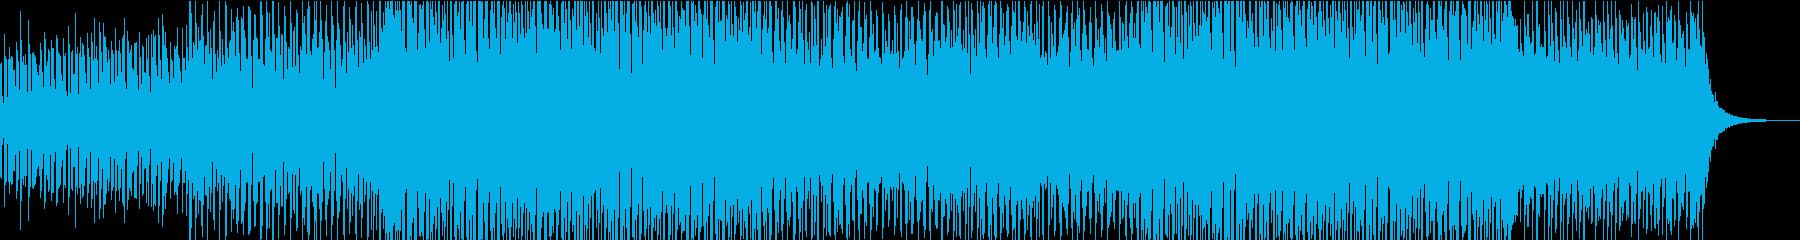 TV・ラジオのBGMを意識したエレクトロの再生済みの波形